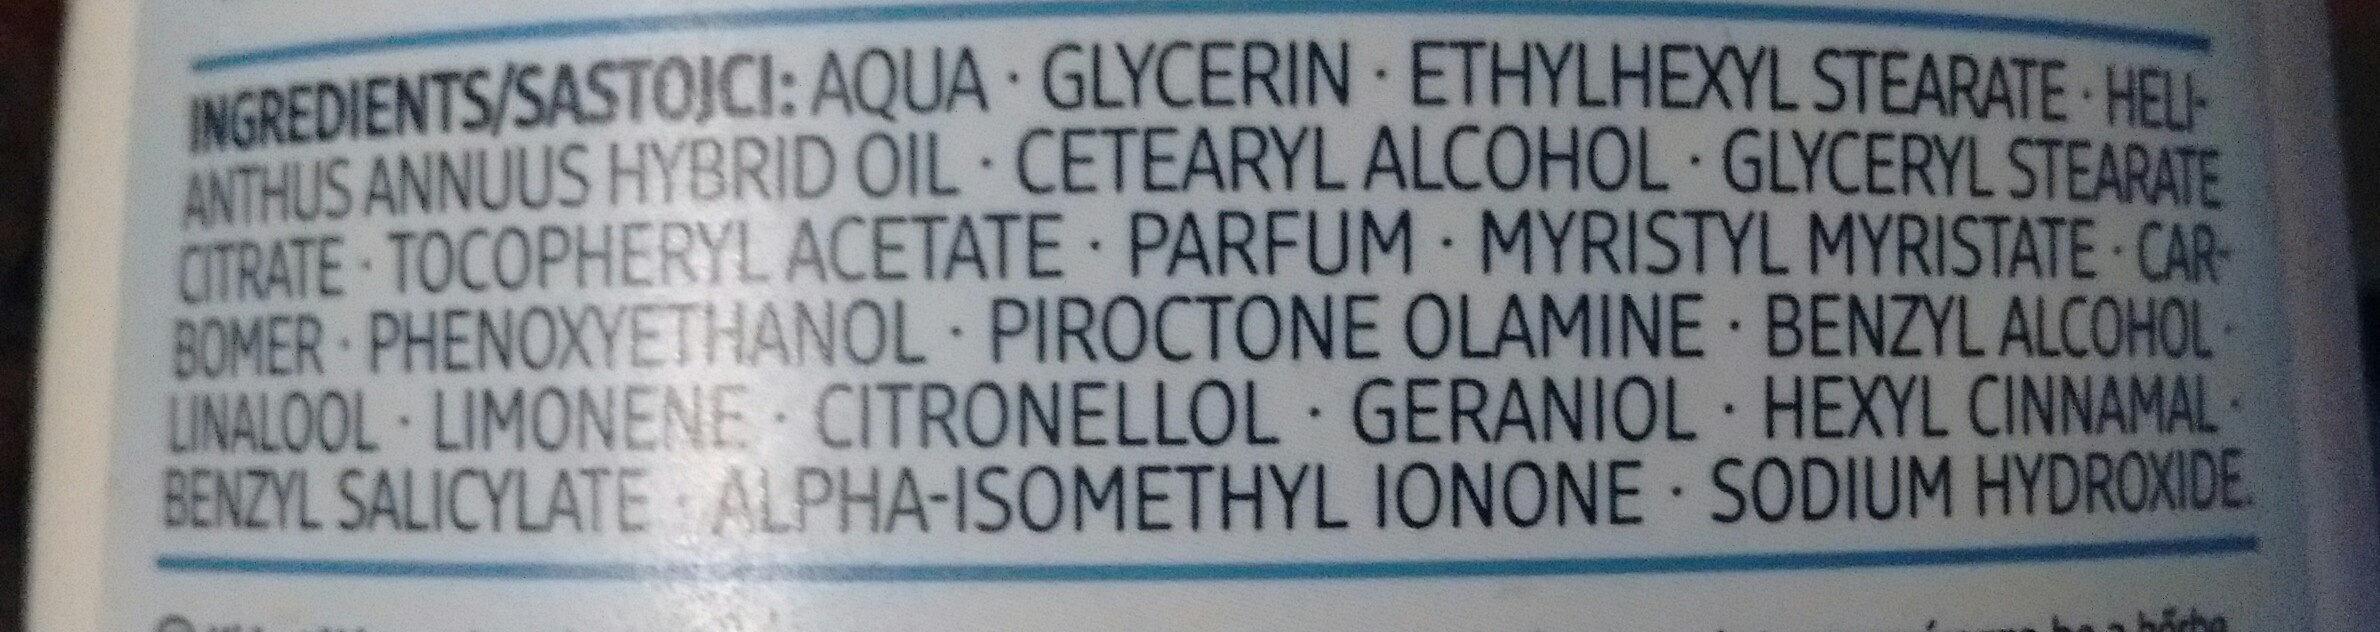 Balea Leichte Bodylotion - Ingredients - de